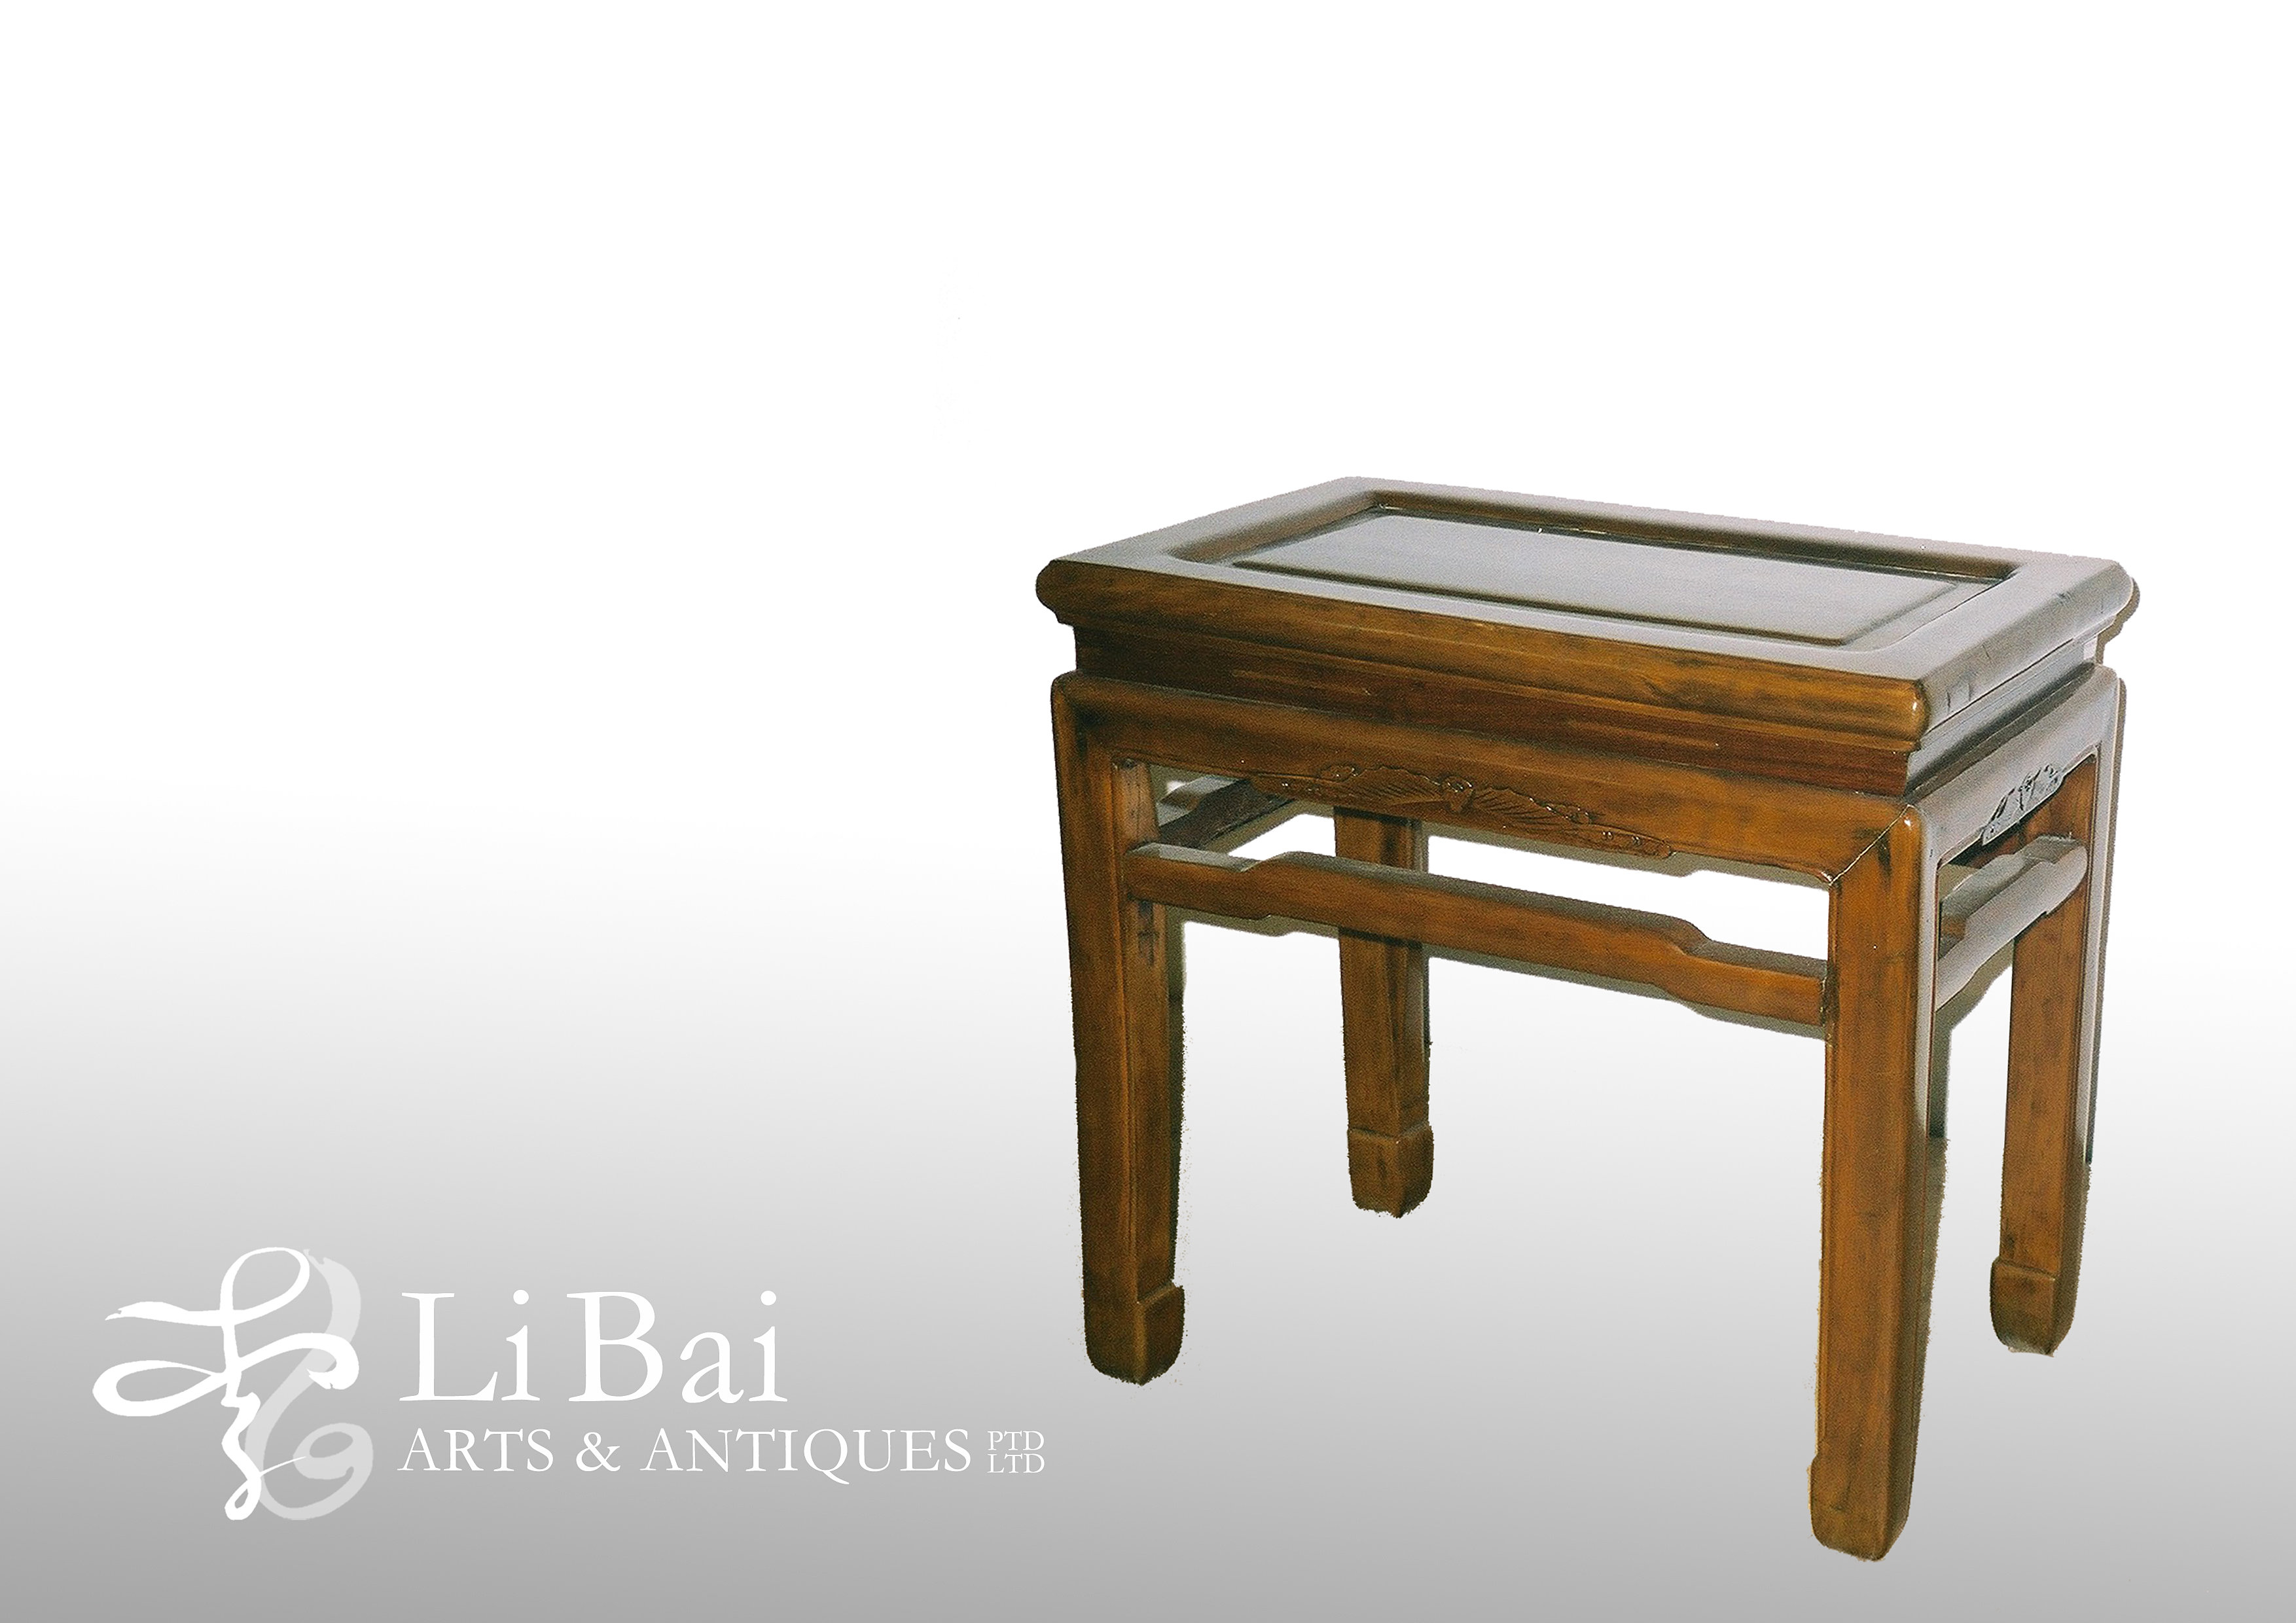 Li bai arts and antiques classic antique furniture shops for Chinese antique furniture singapore